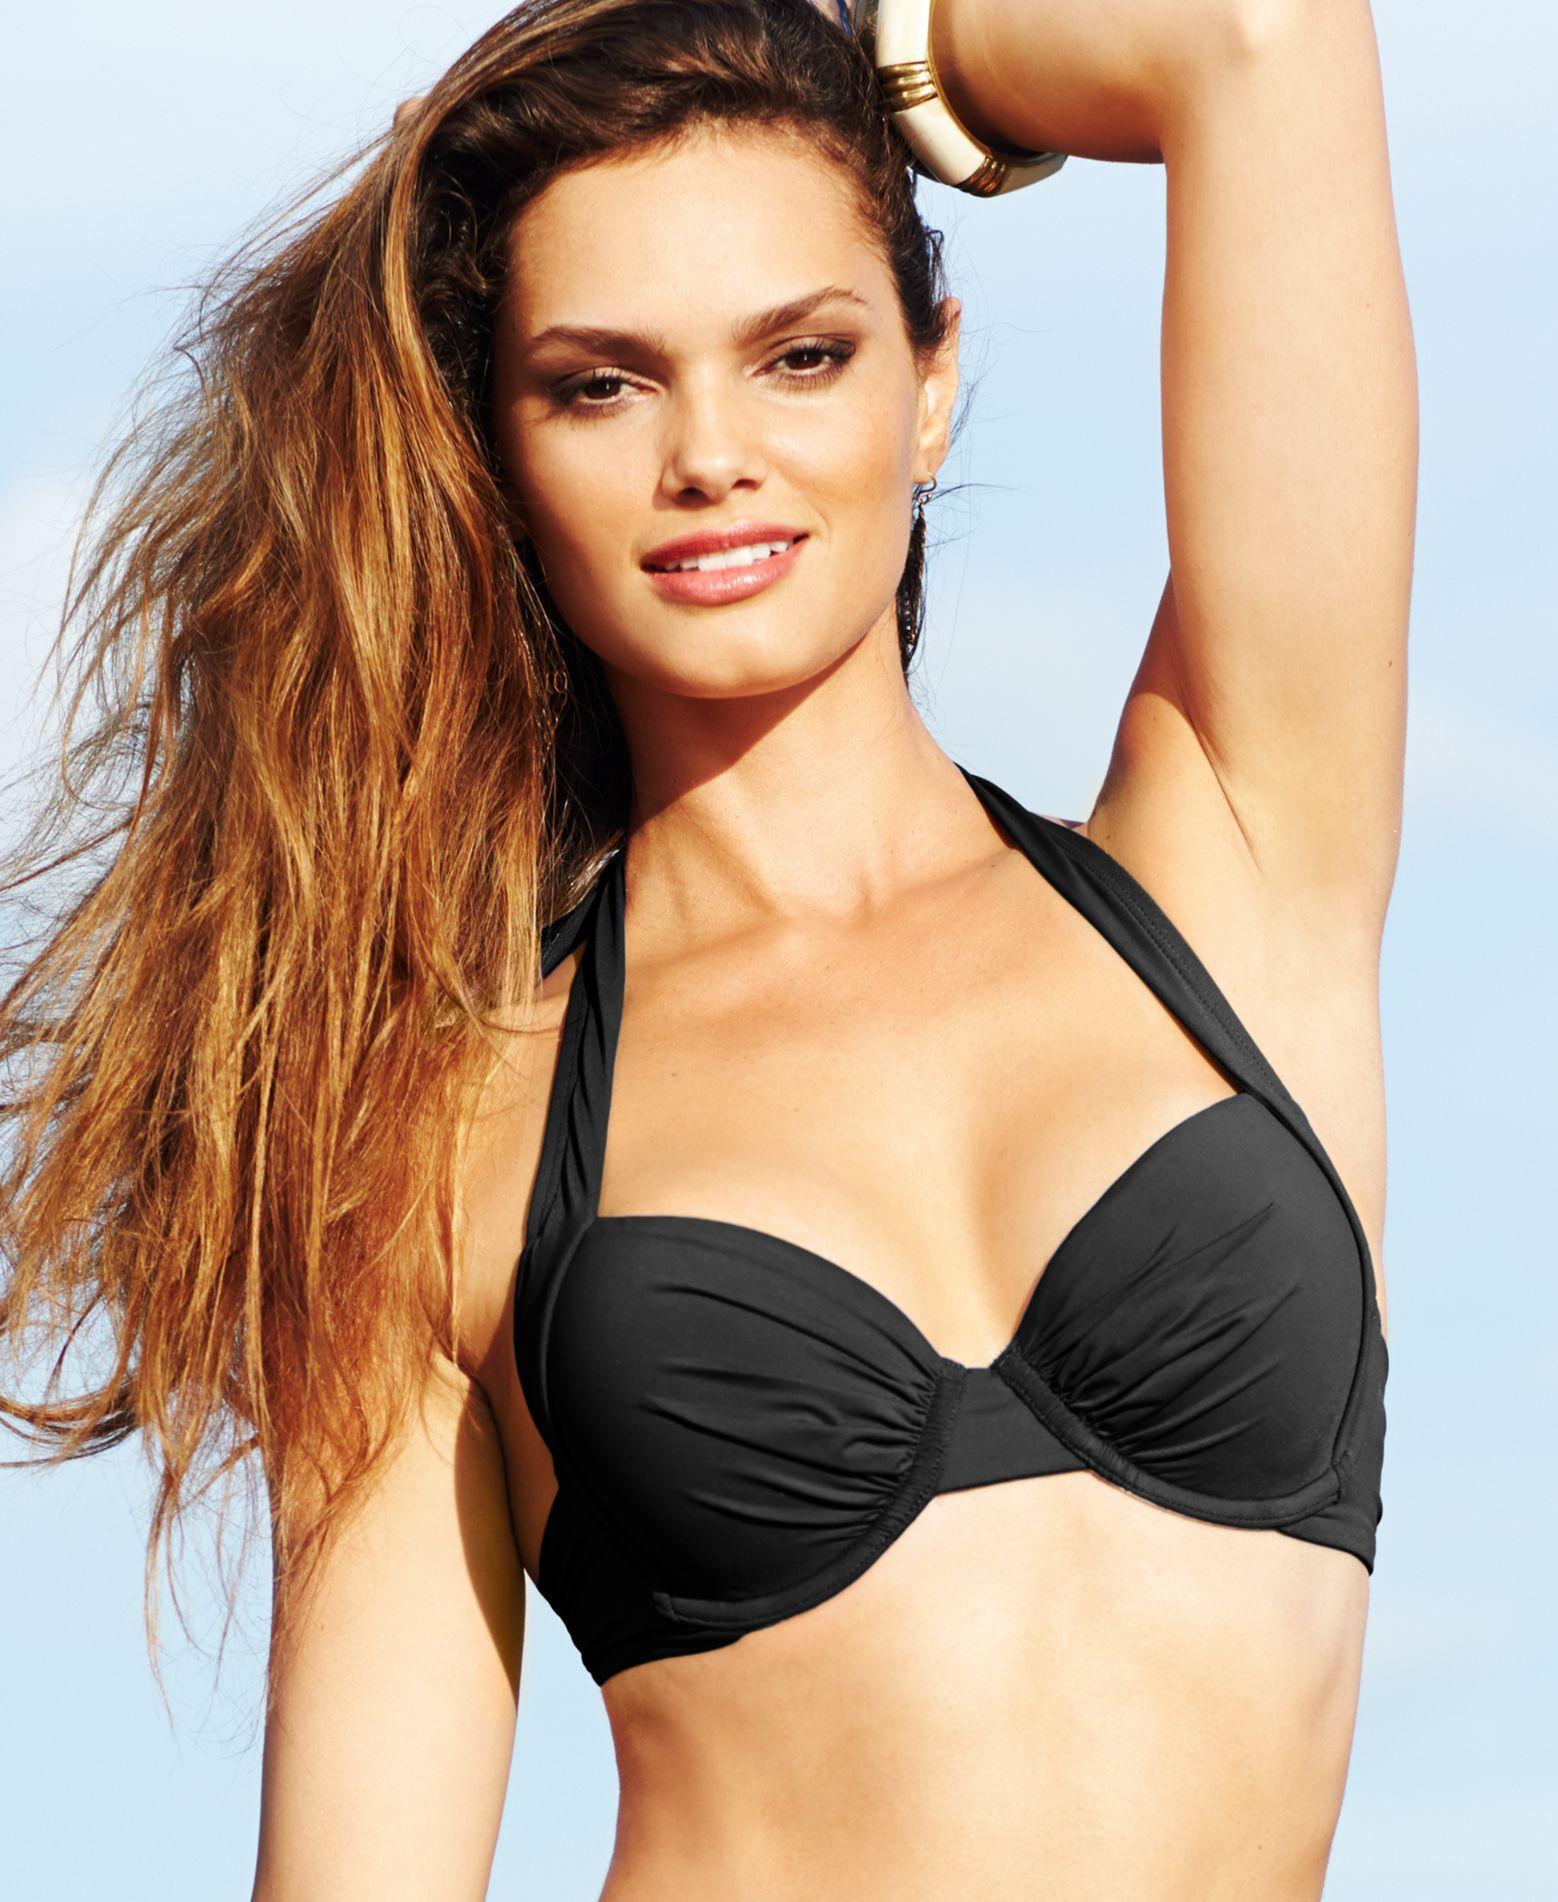 dbcb1a16a0 Tommy Bahama Underwire Halter Bikini Top   Products   Bikini tops ...